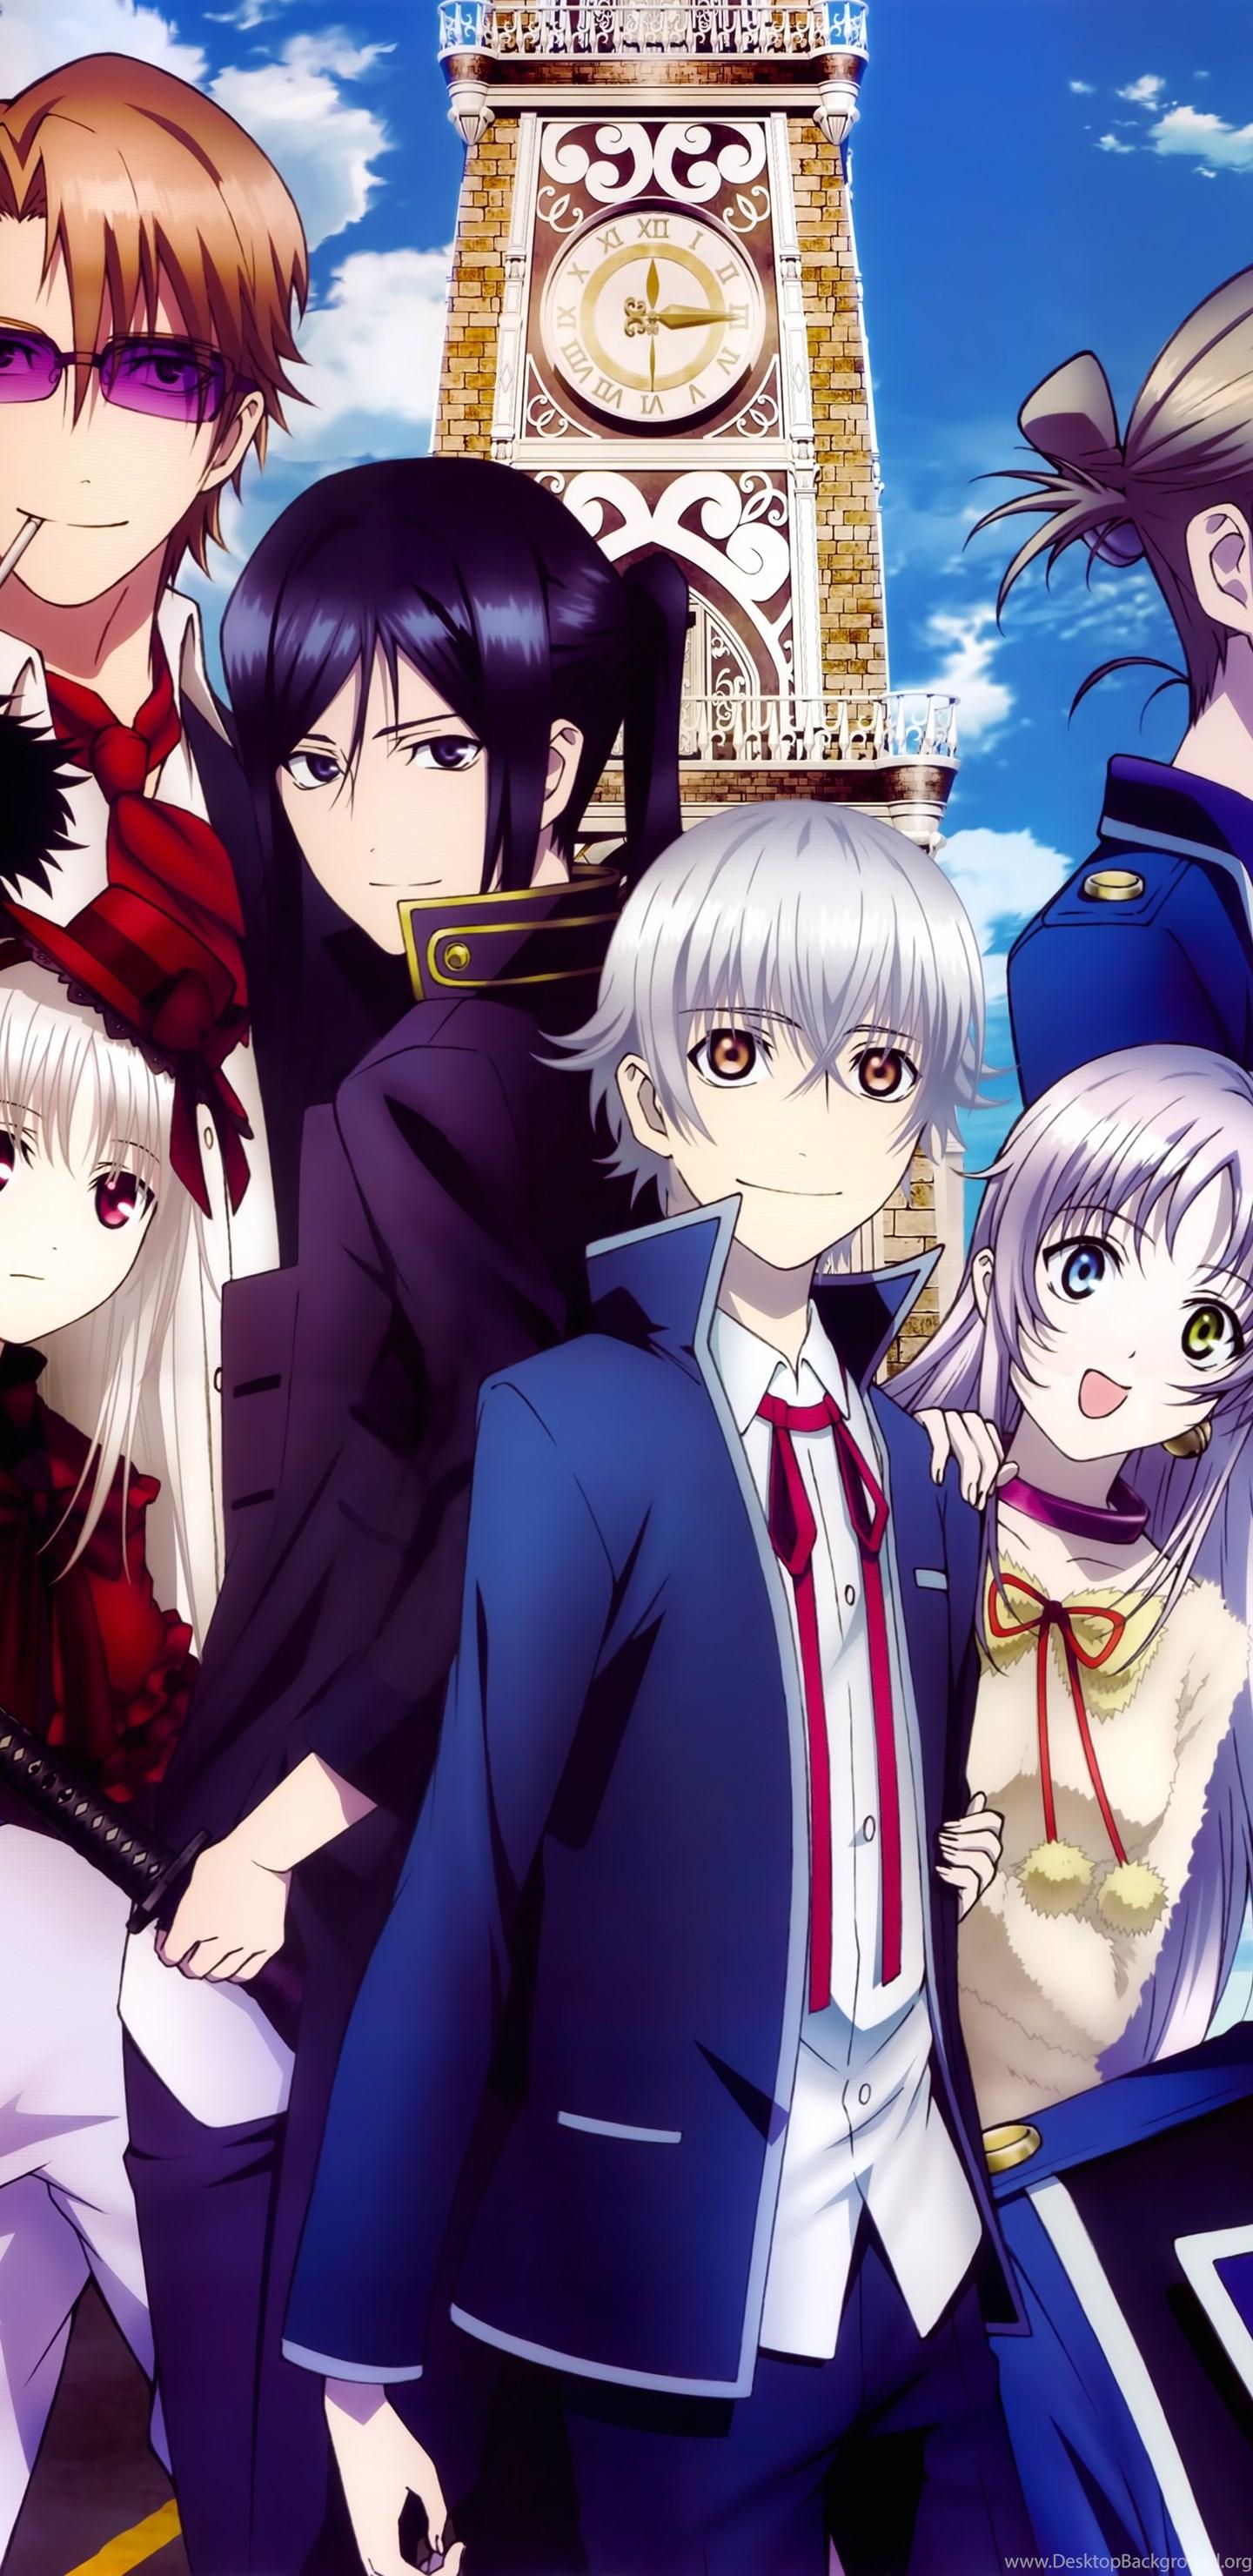 Anime Series K Project Group Friend Girls Guys Blue Sky